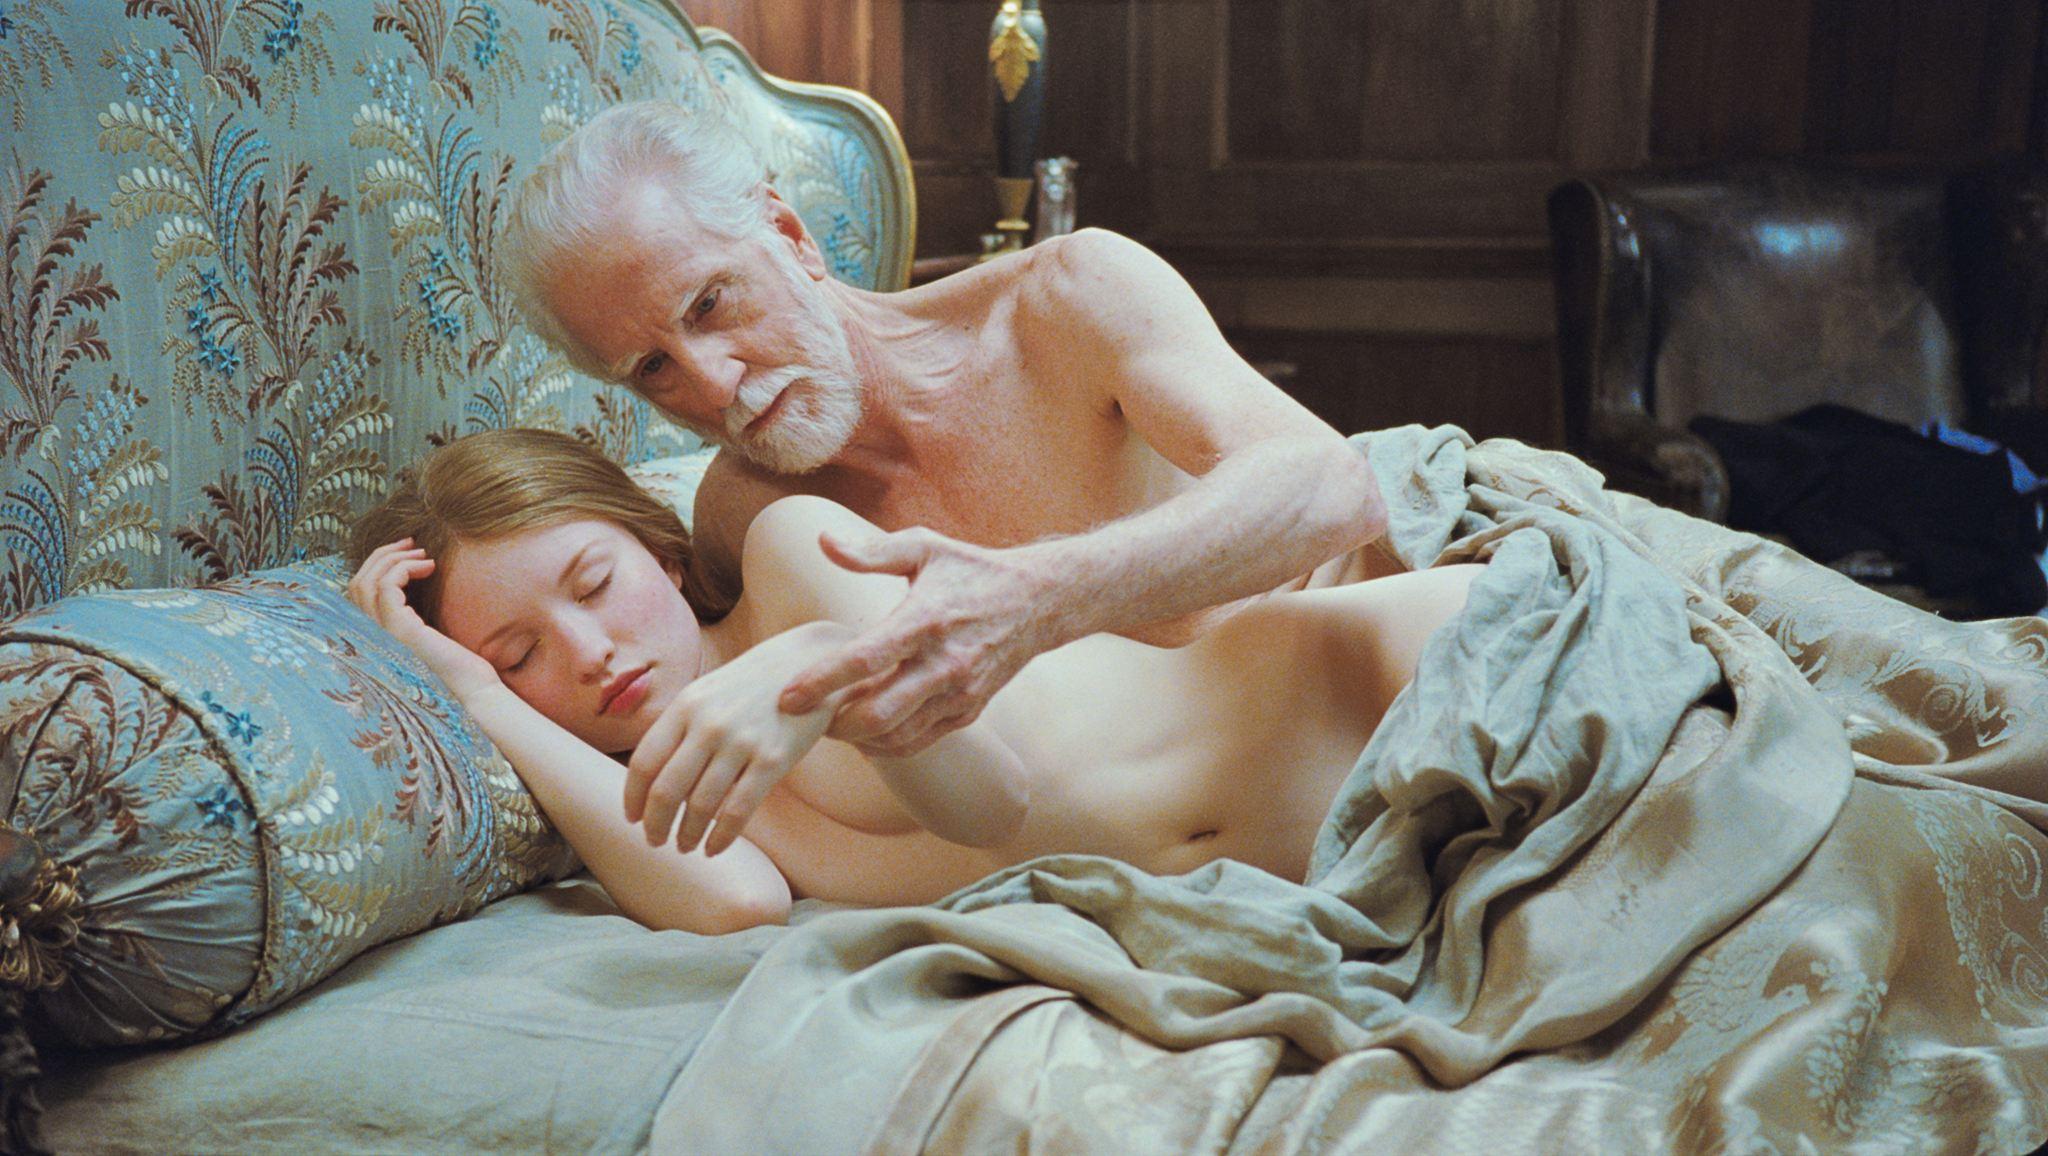 Спящая девушка эротика онлайн